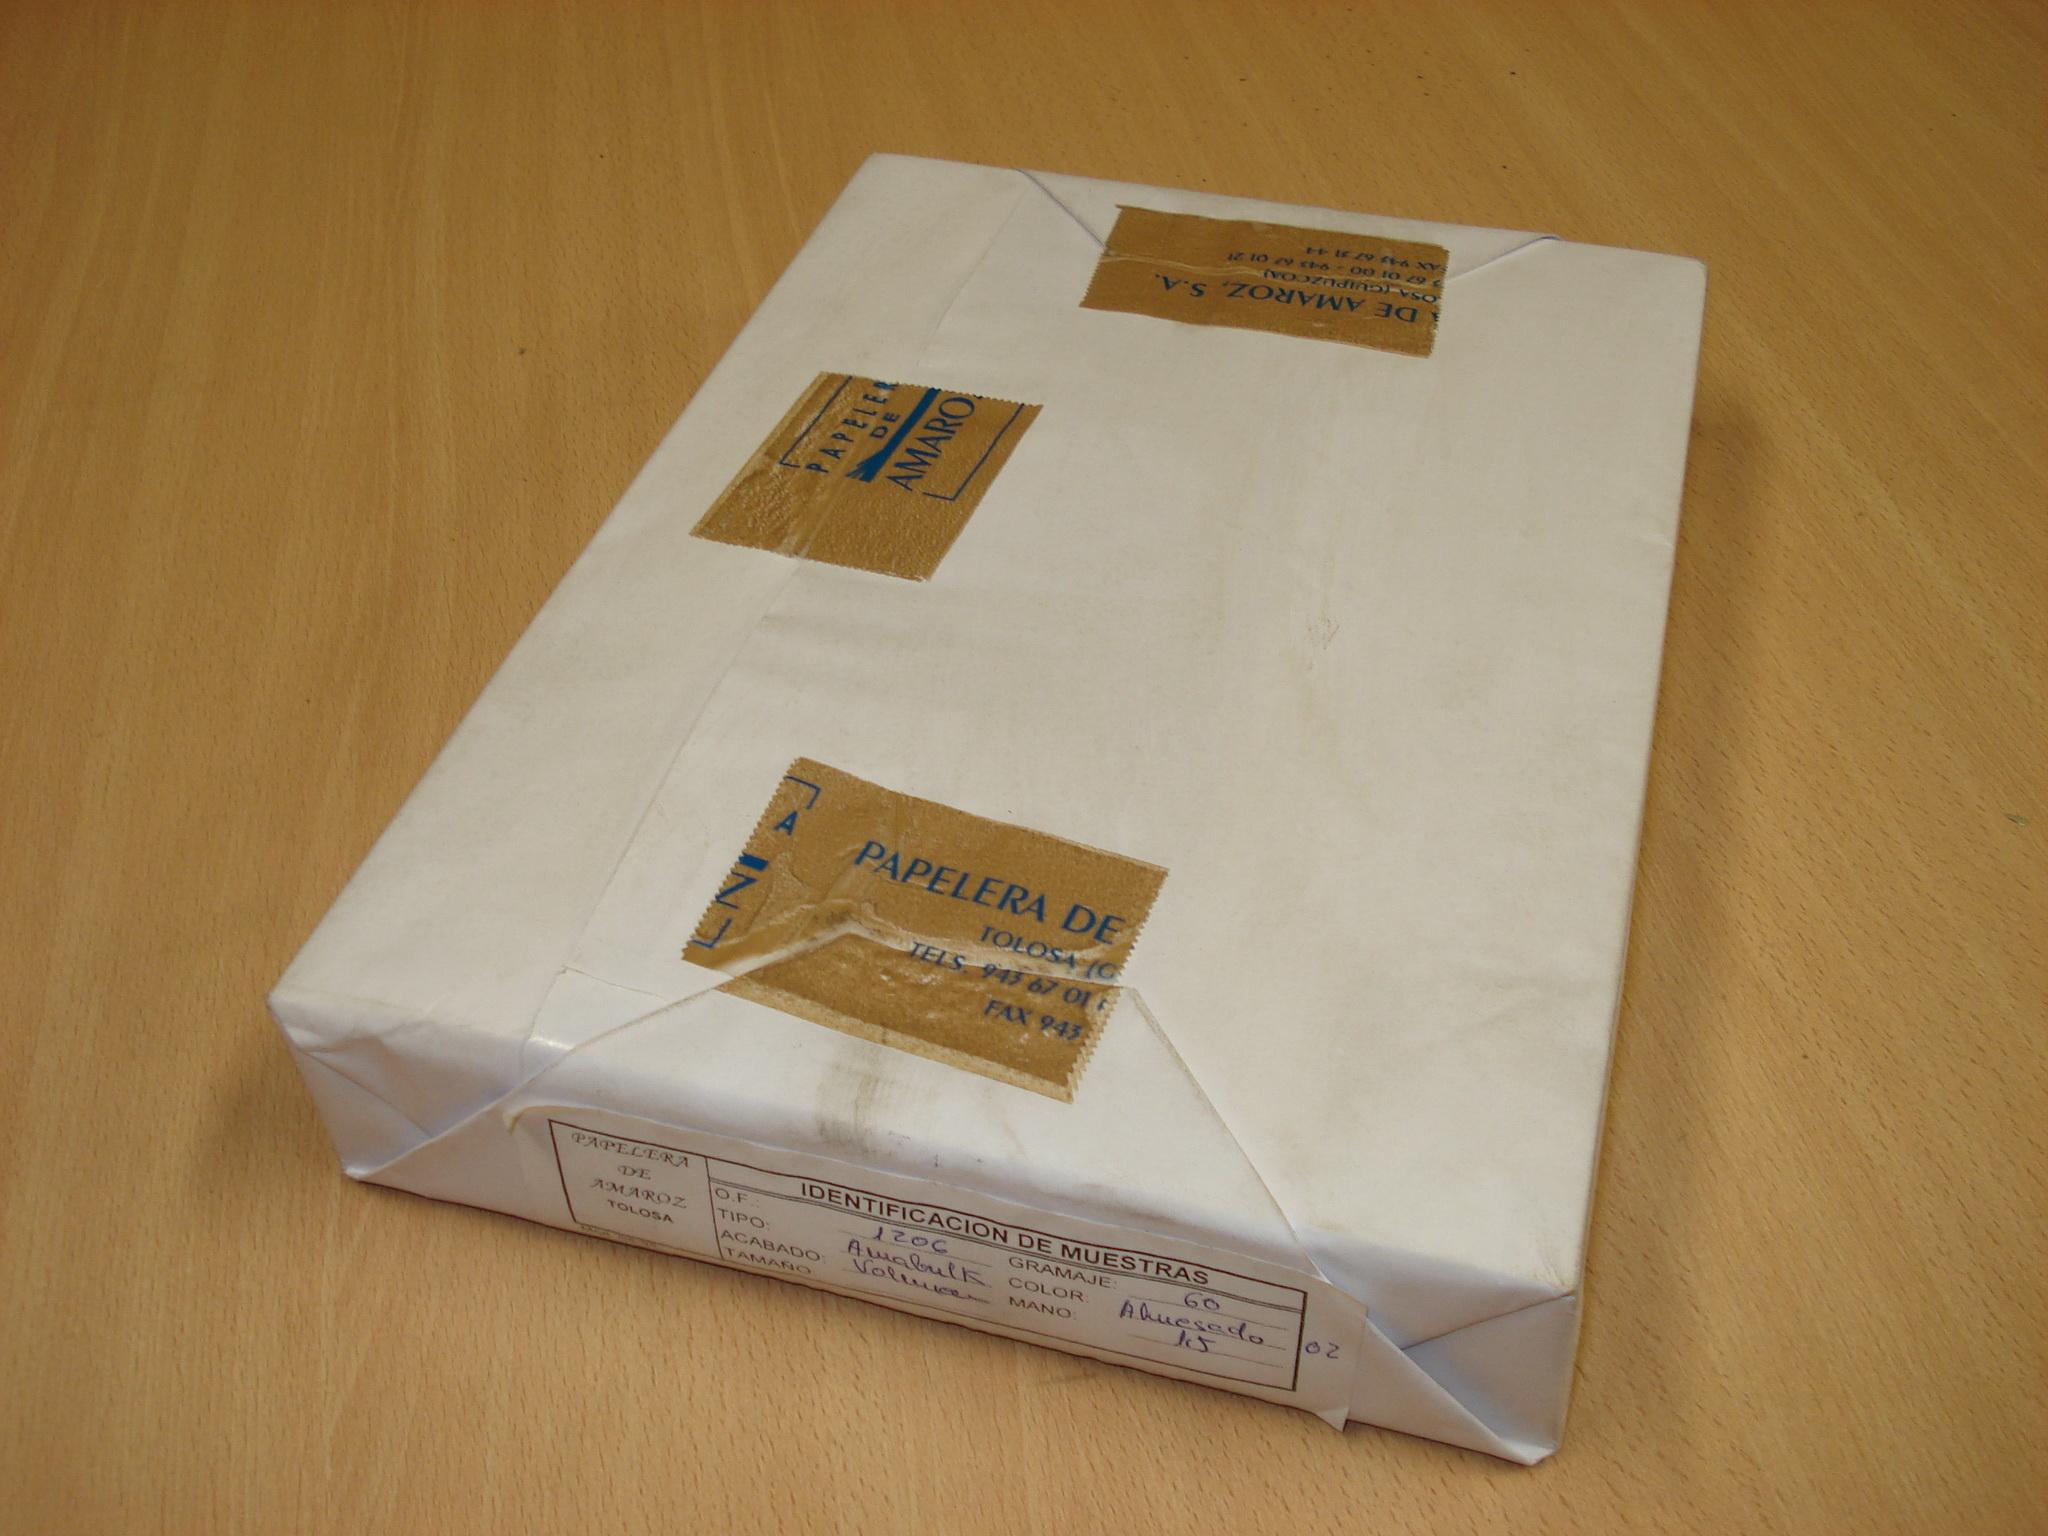 Paquete de hojas blancas PAPELERA DE AMAROZ